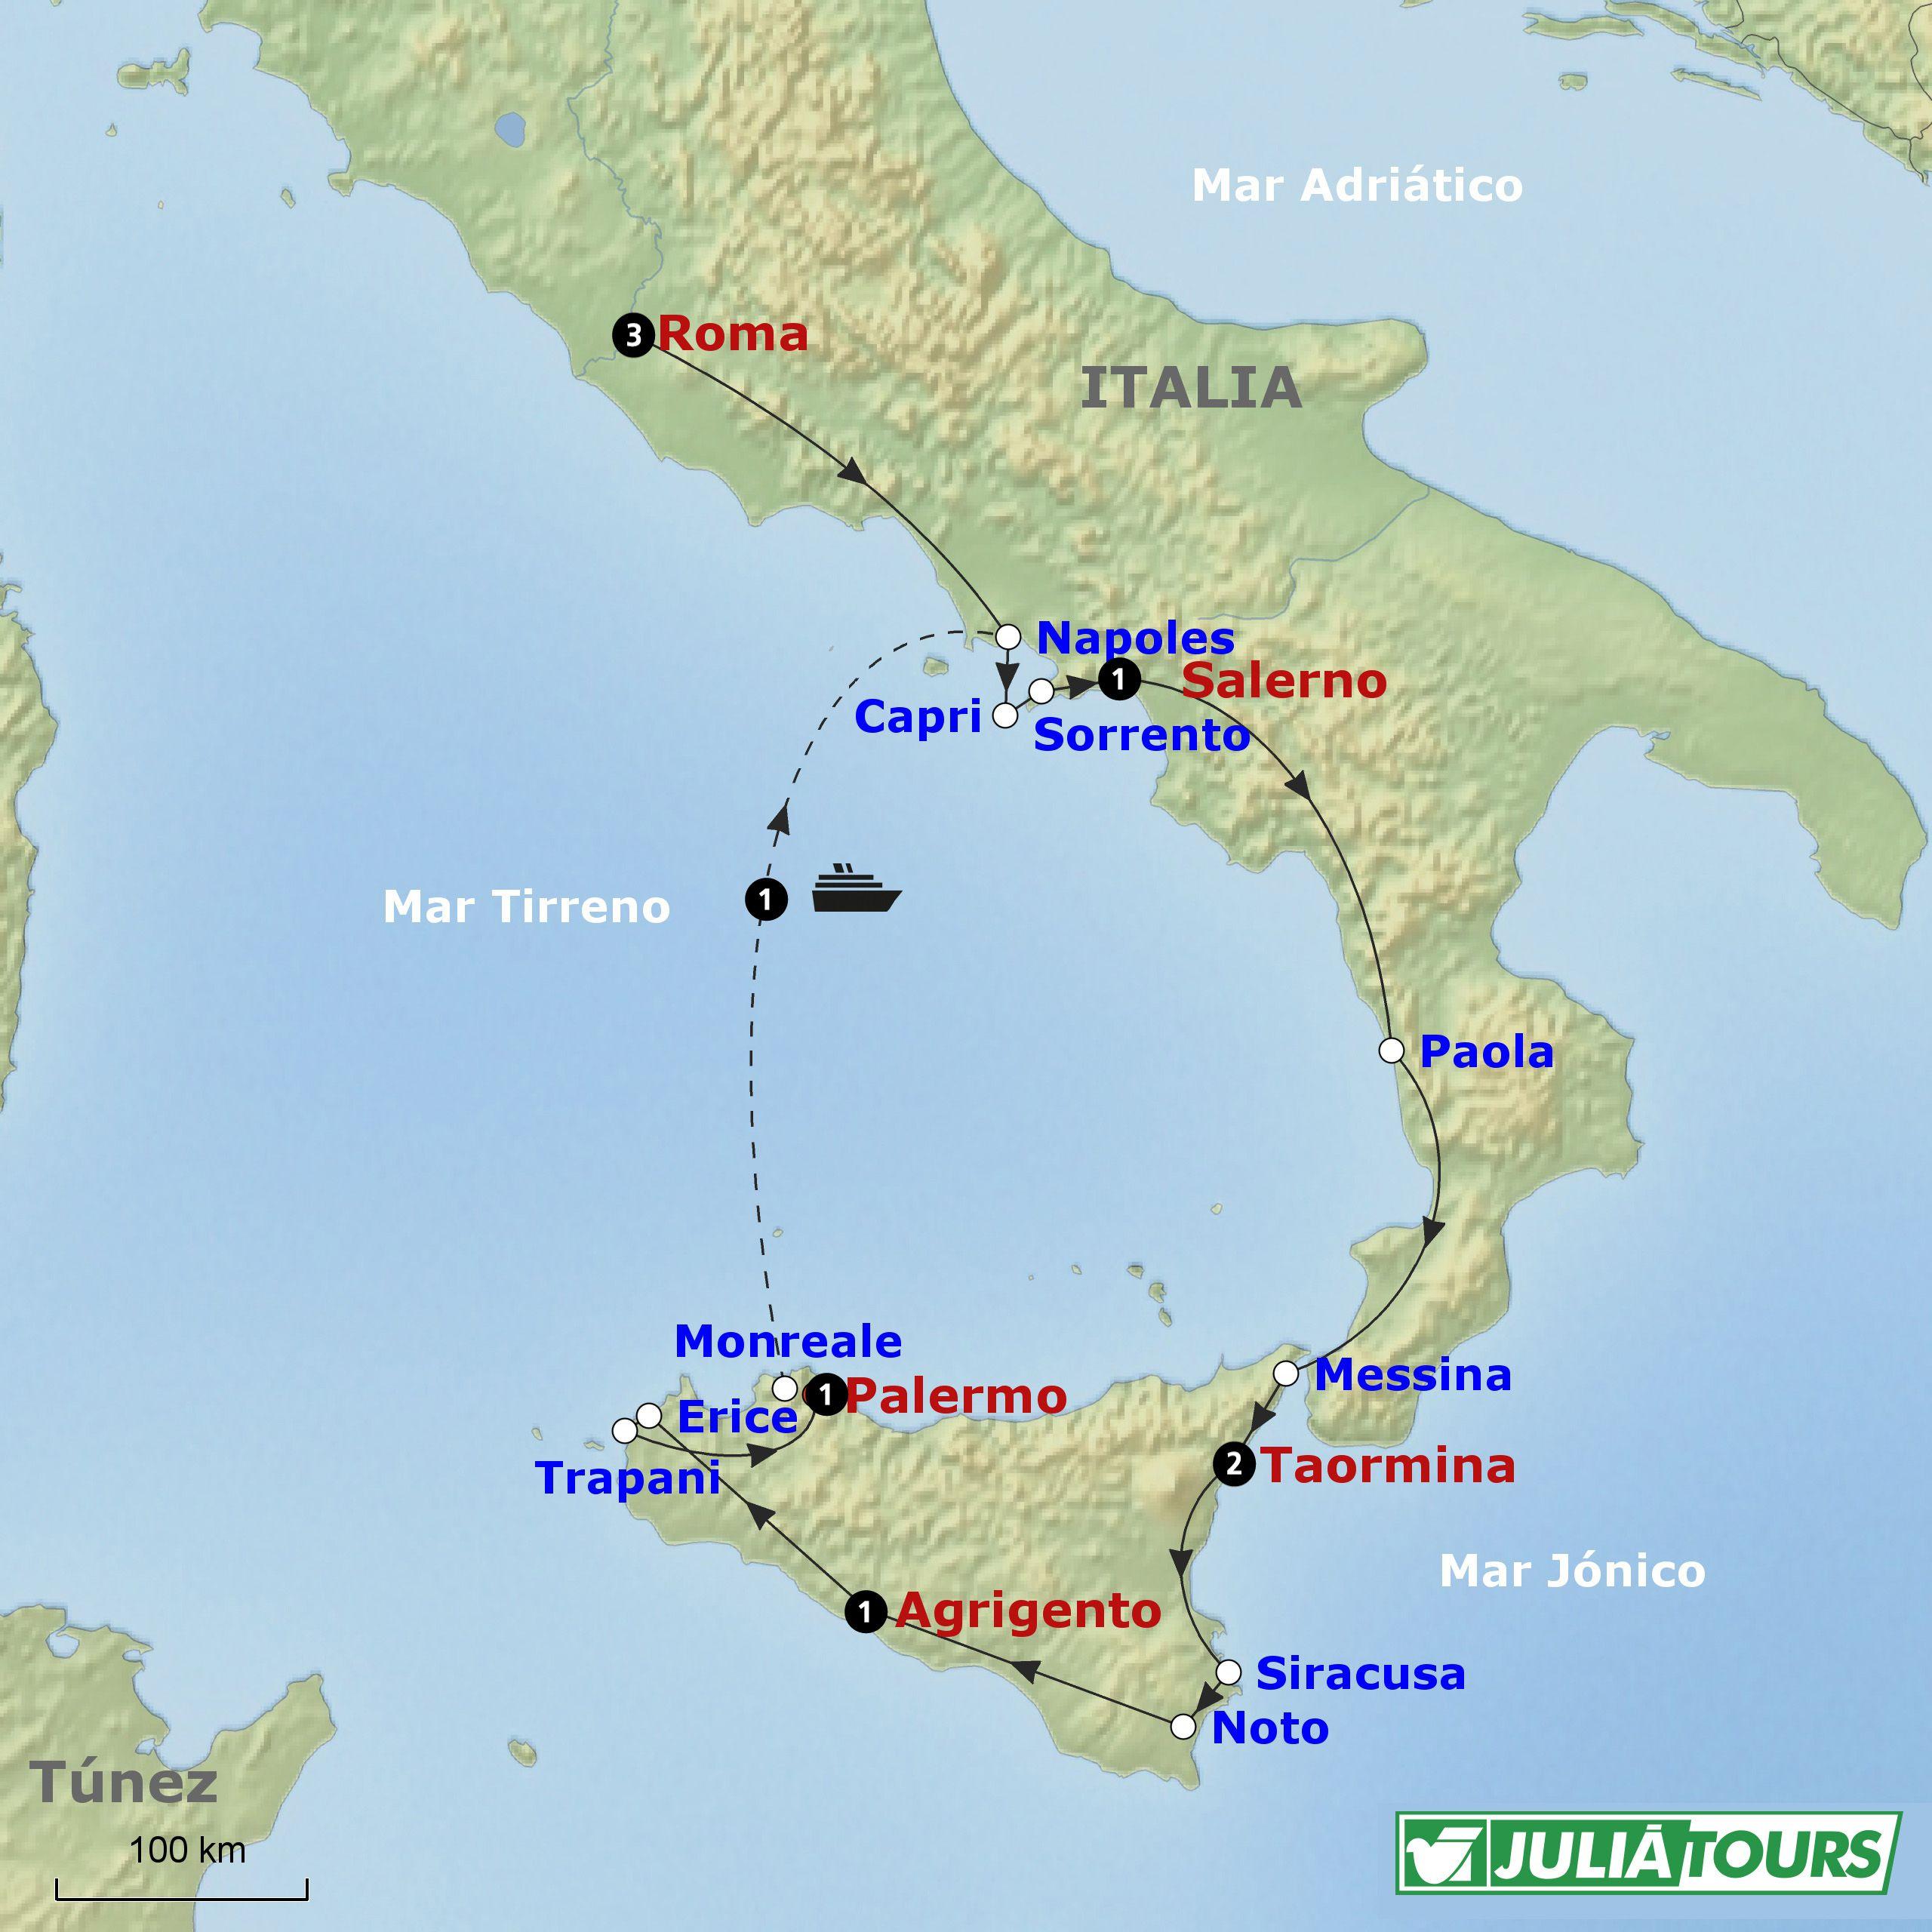 mapa sur de Italia con Capri  de bsqueda  viaje sur de italia